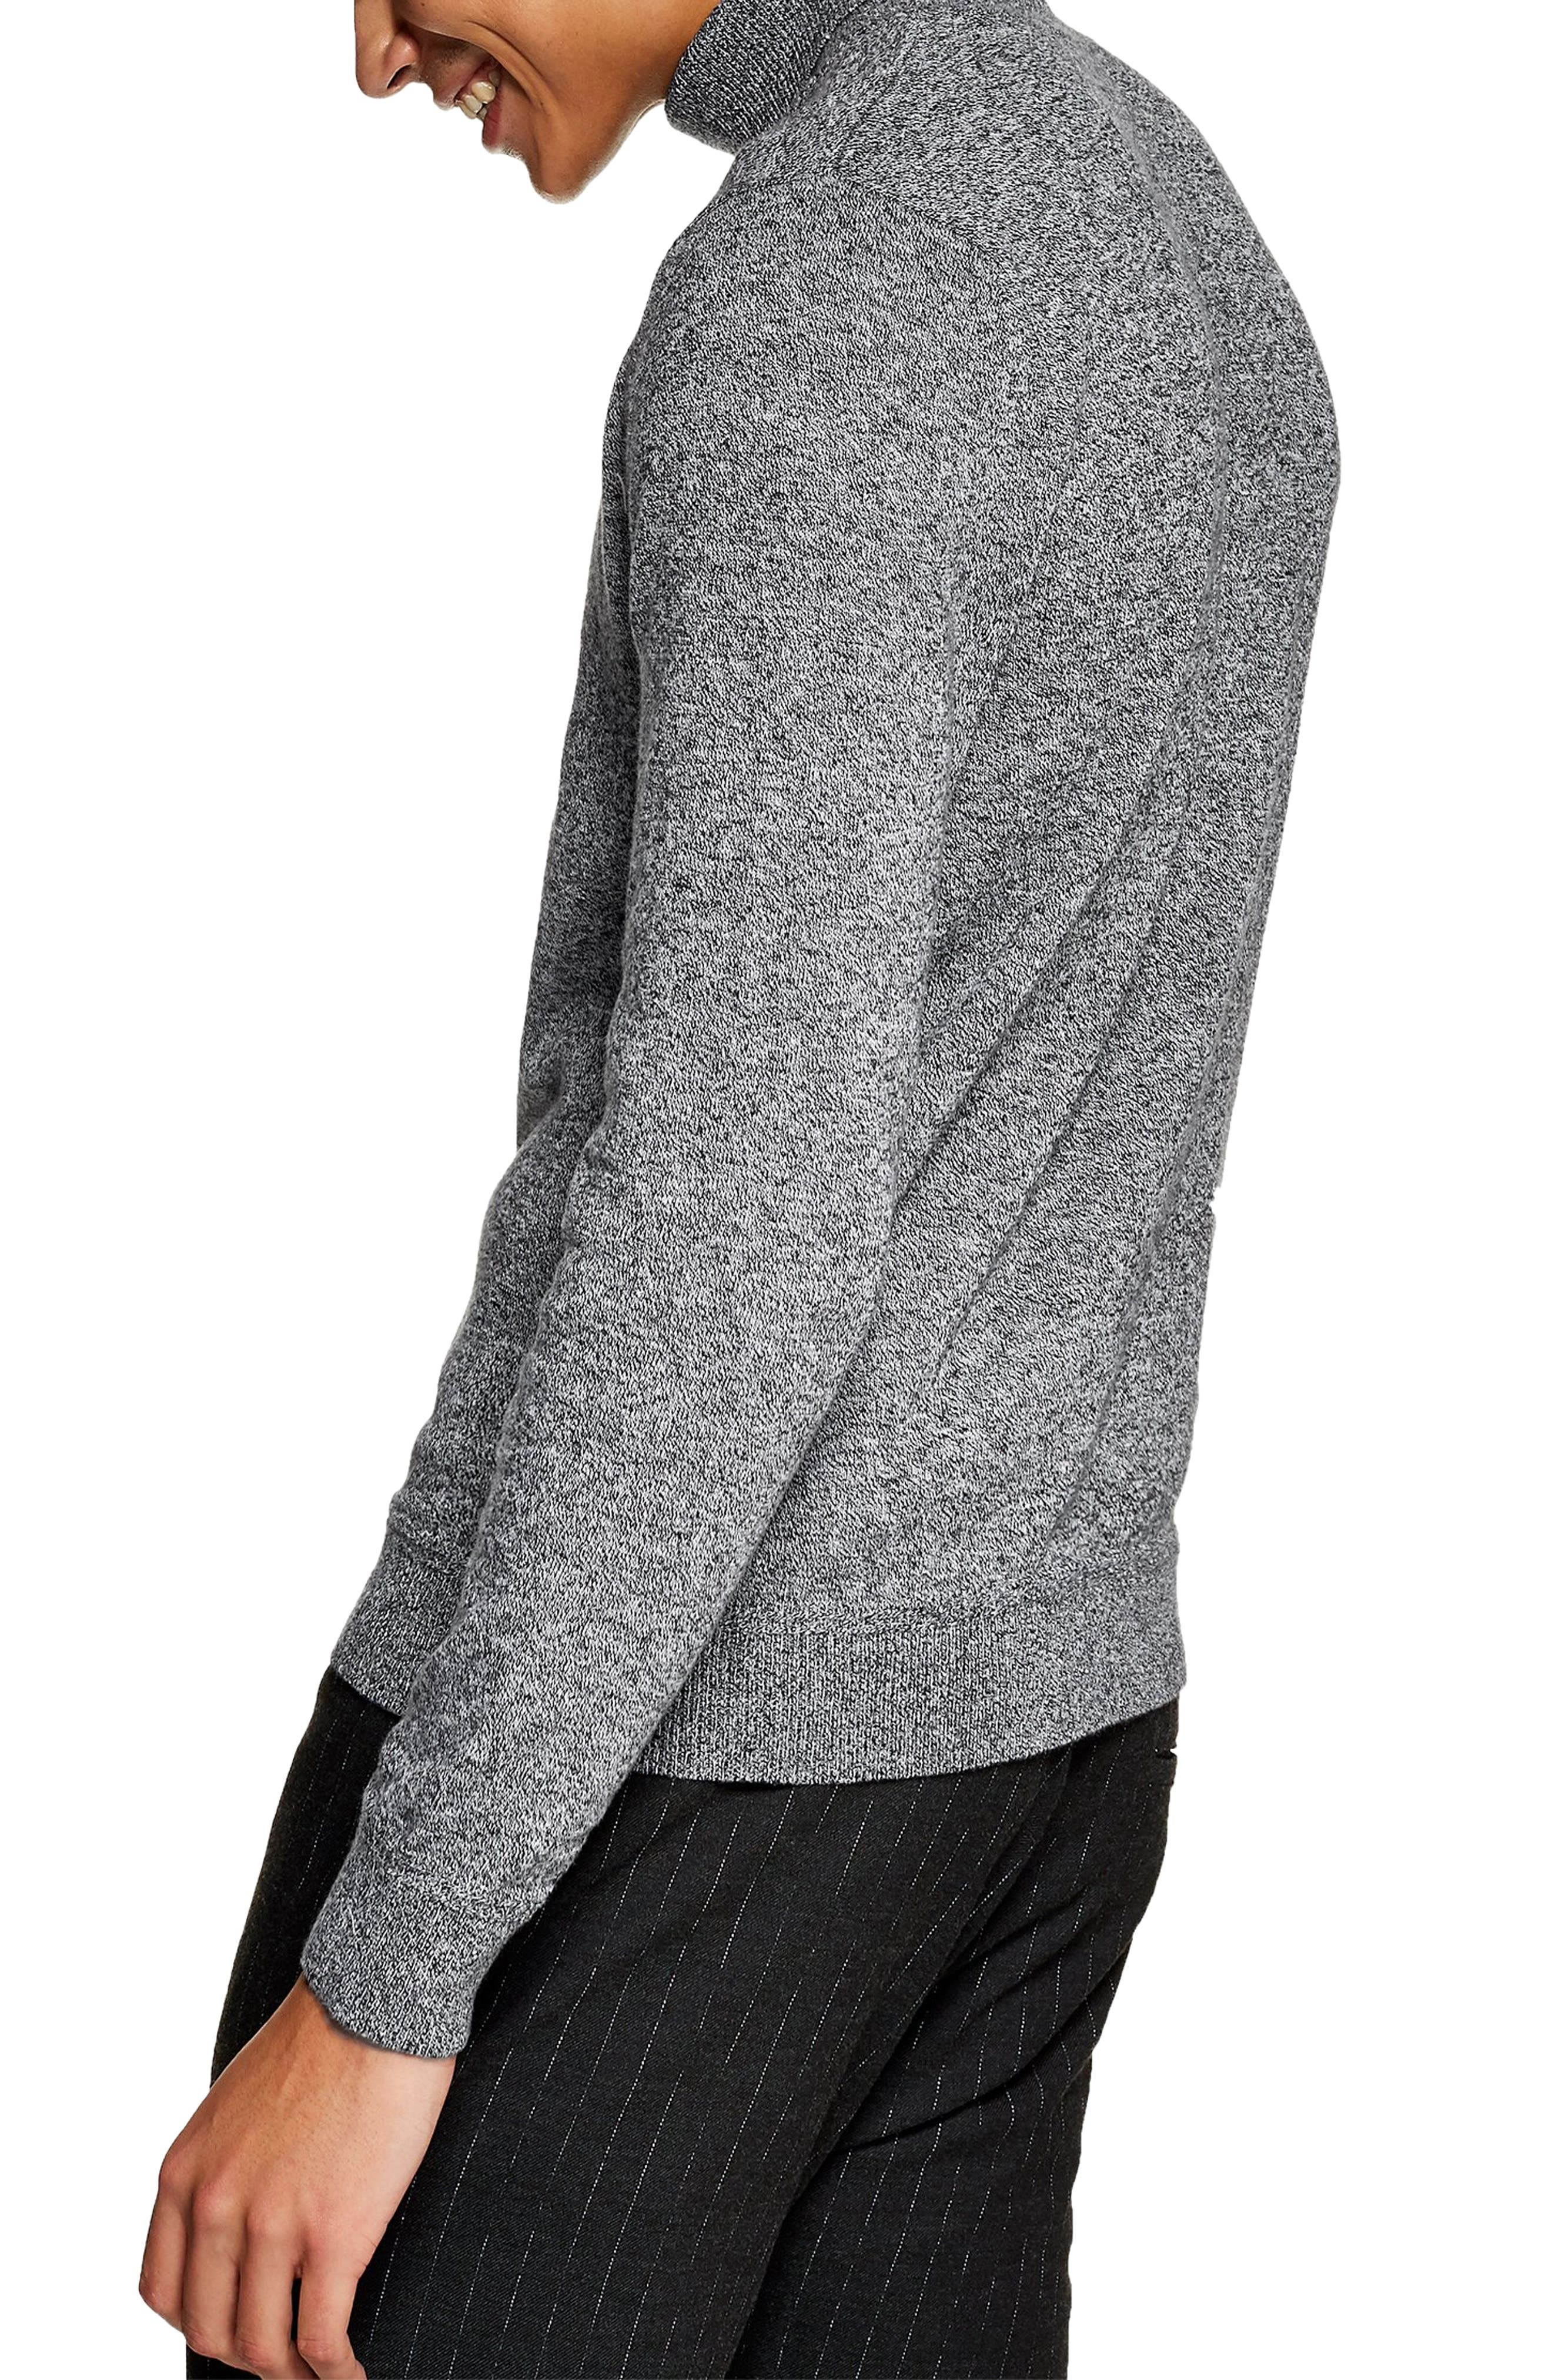 Classic Fit Turtleneck Sweater,                             Alternate thumbnail 2, color,                             020